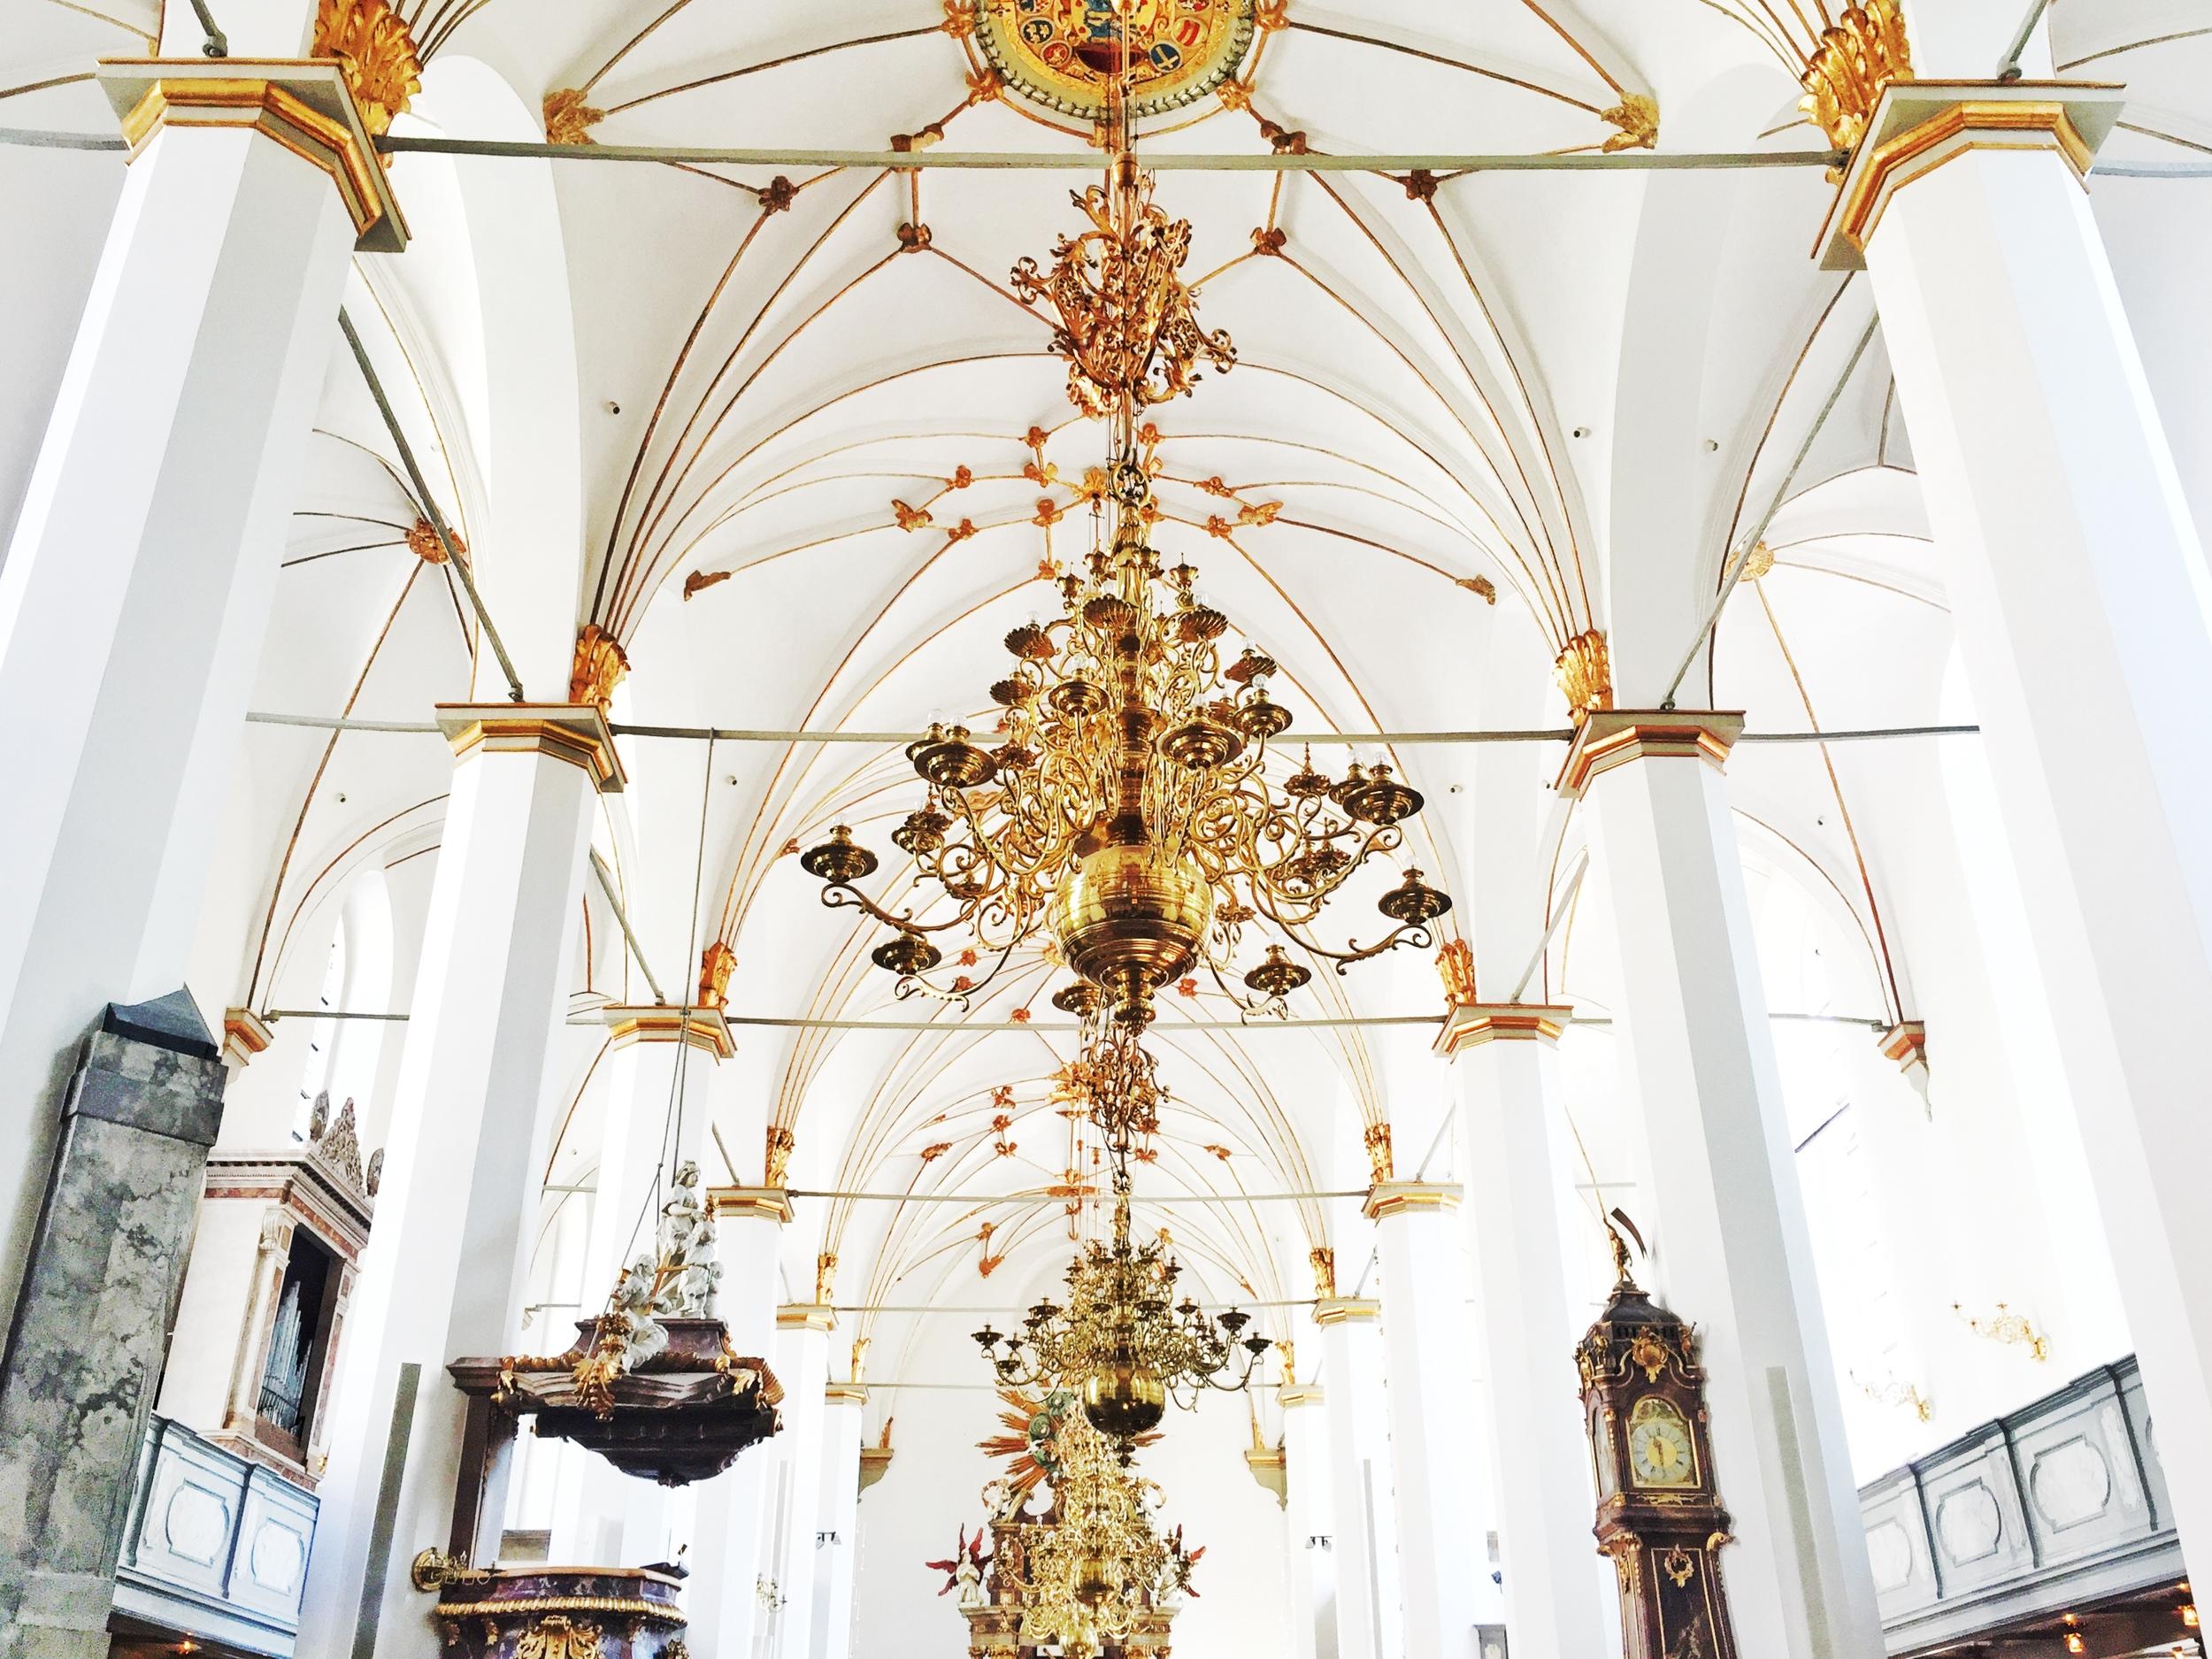 Inside the Trinitatis Church.